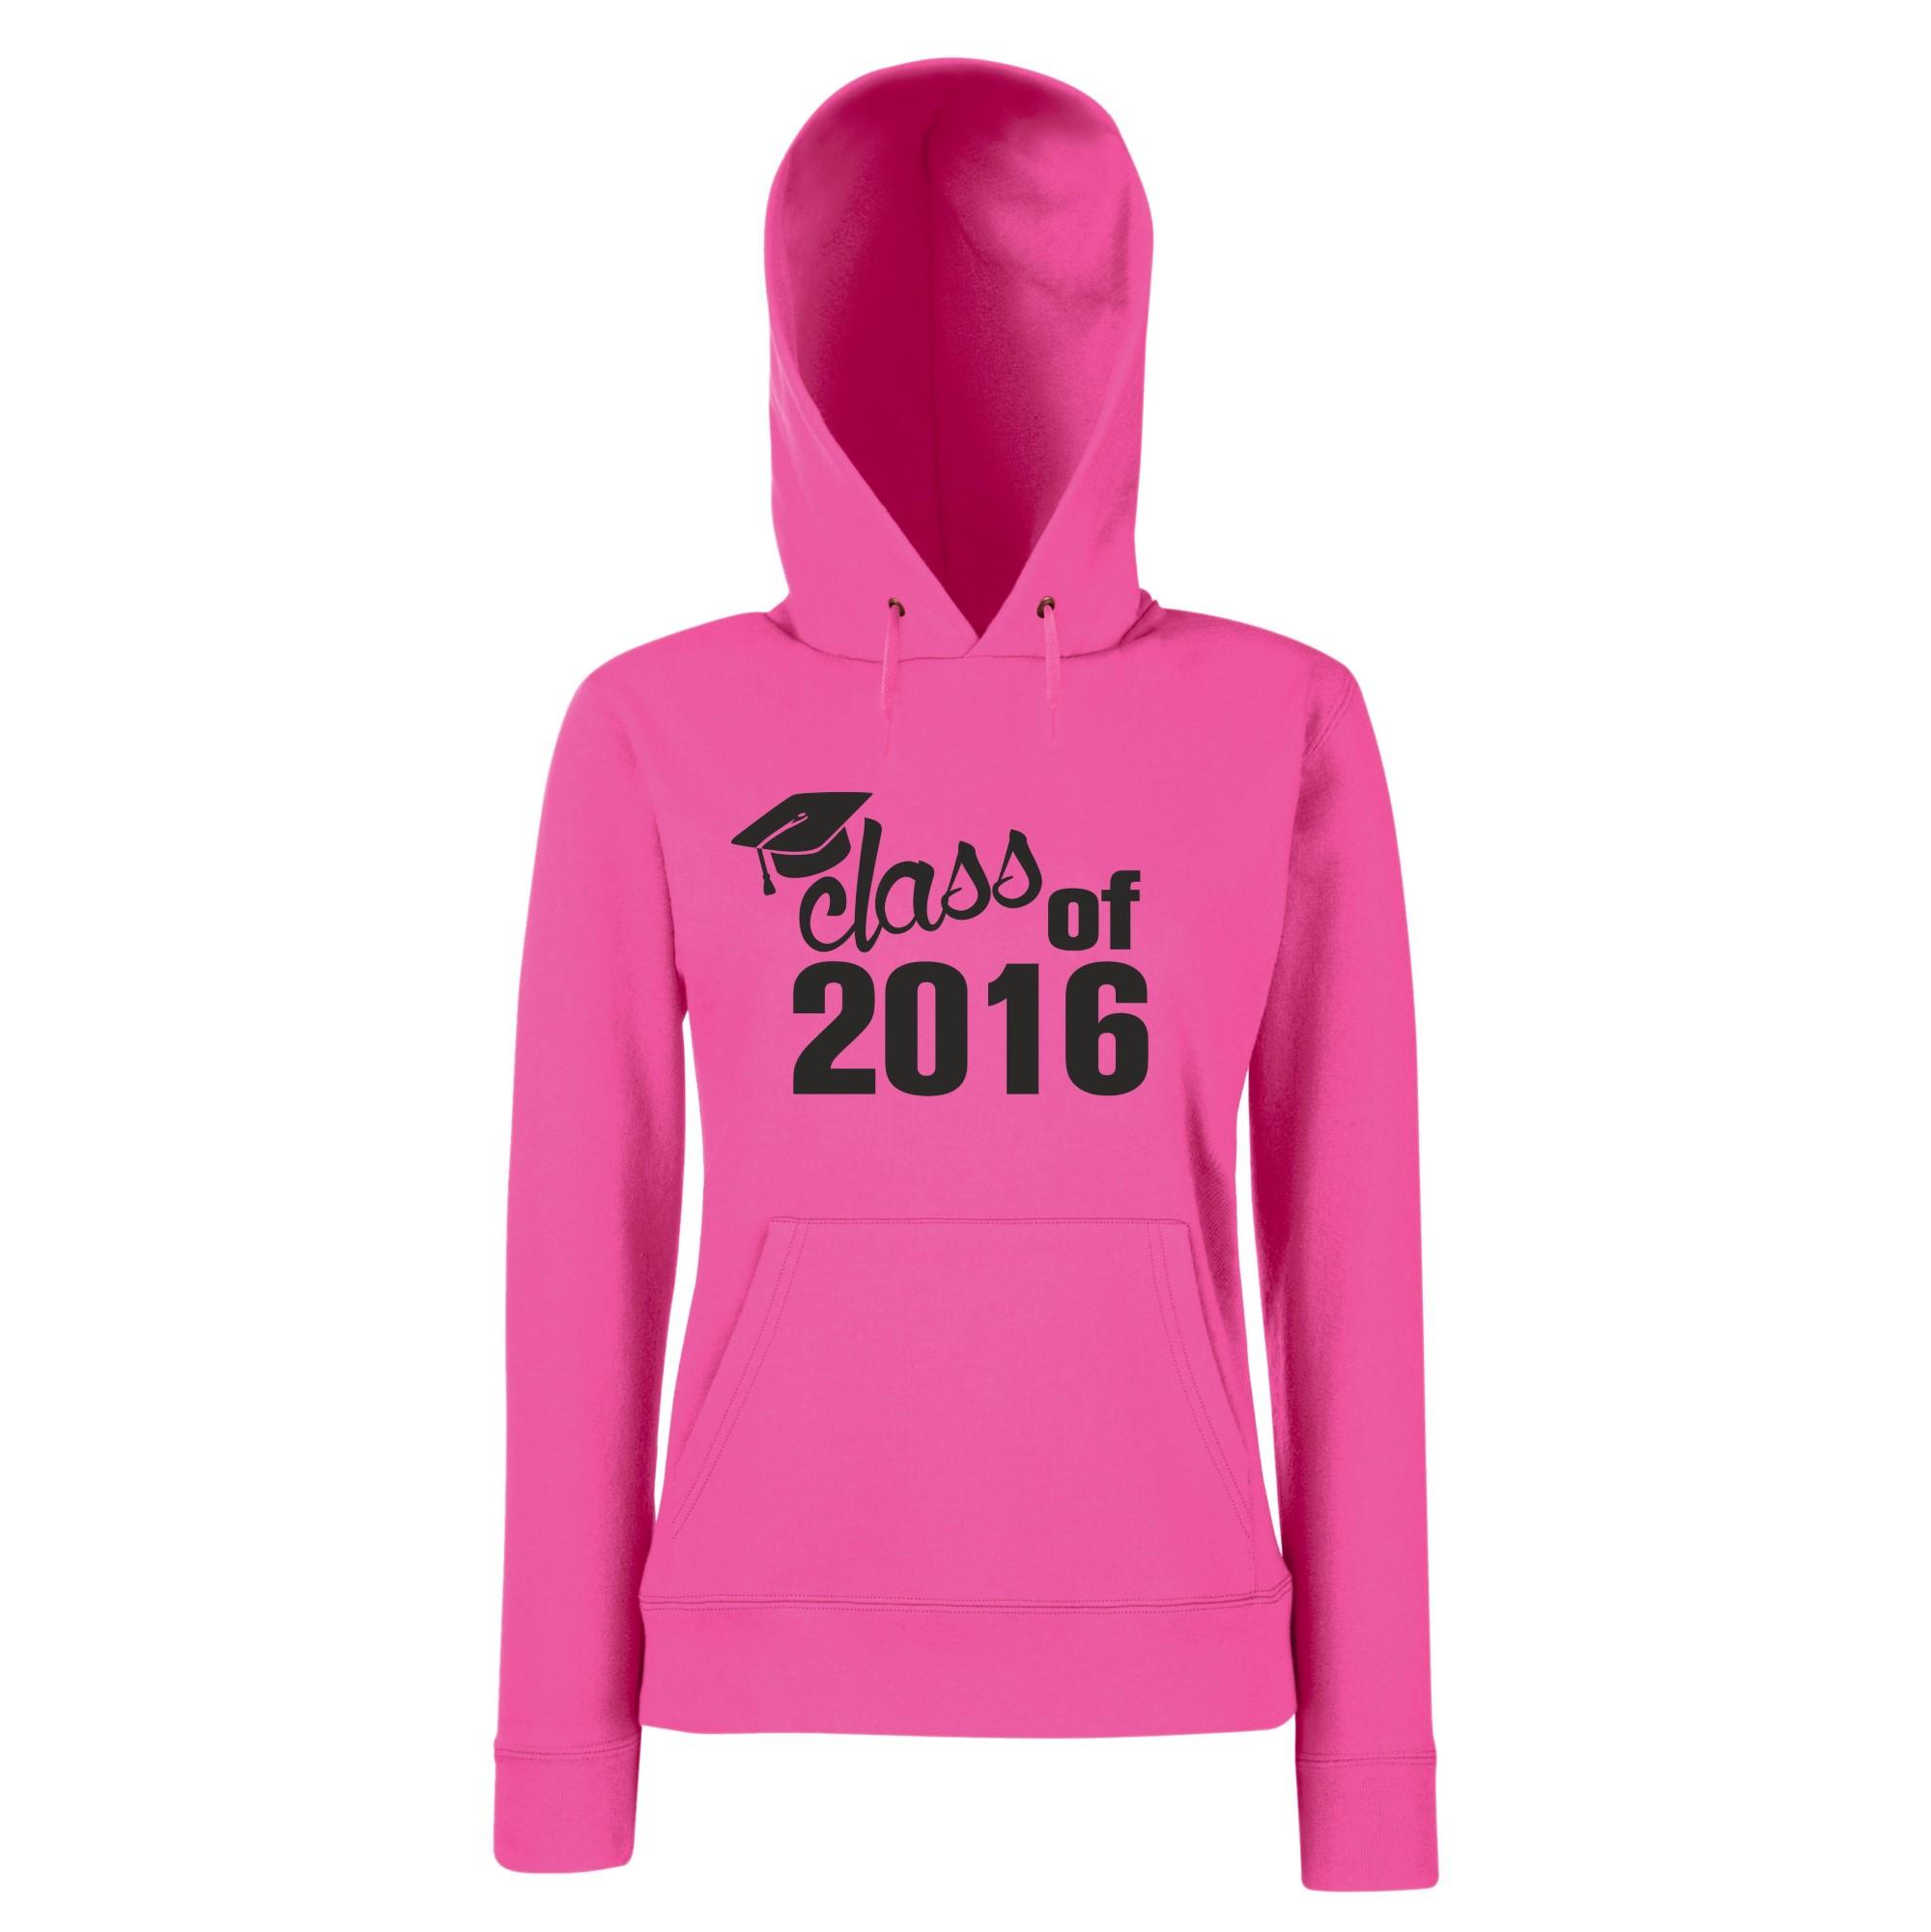 hoodie - damen - class of 2016